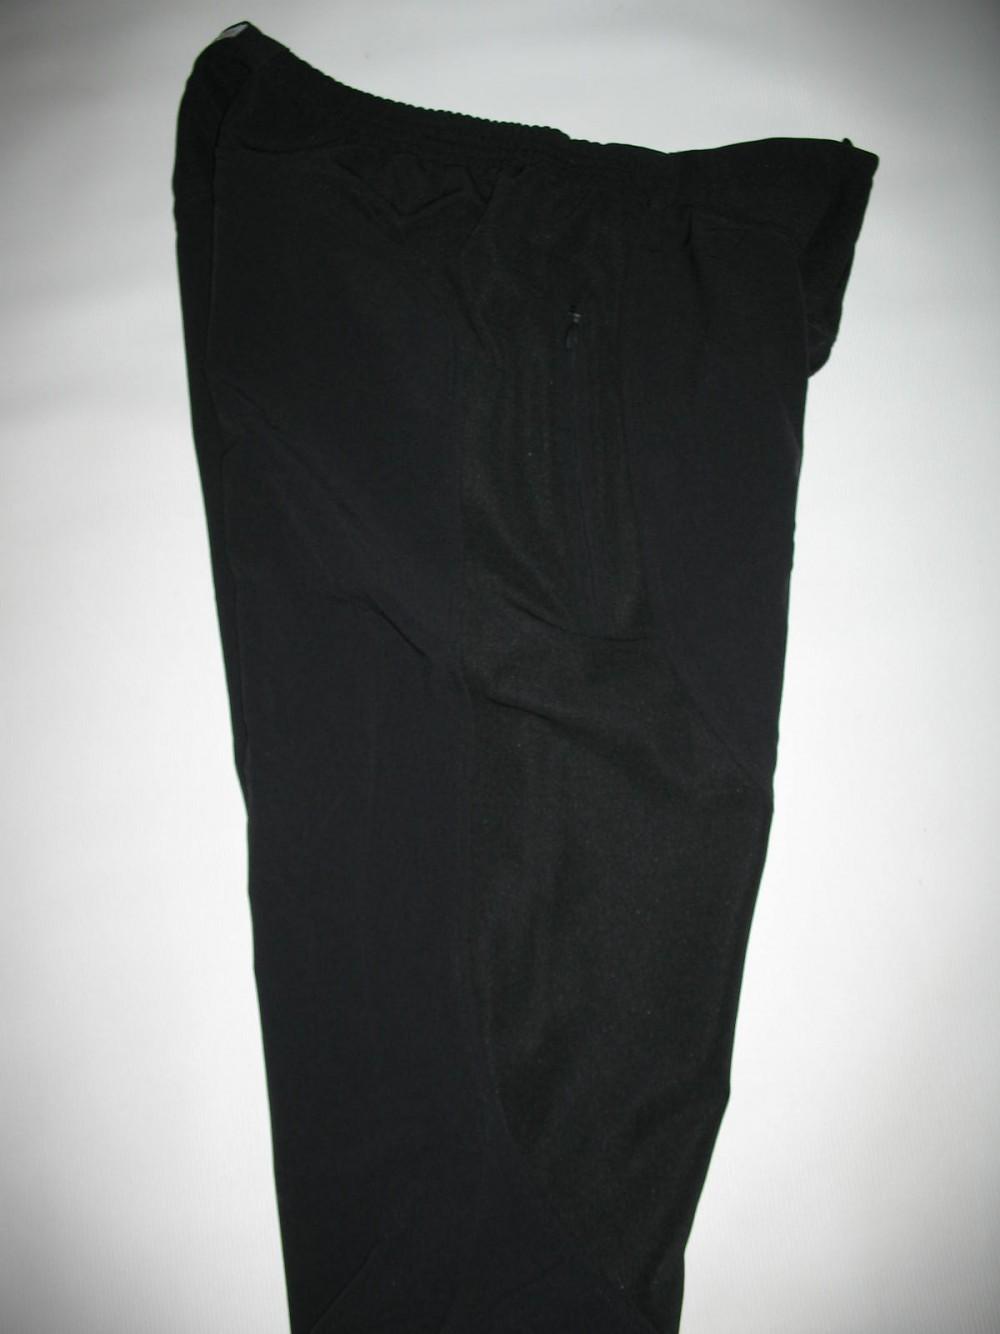 Велоштаны ASSOS db zero track cycling pants (размер XL) - 5